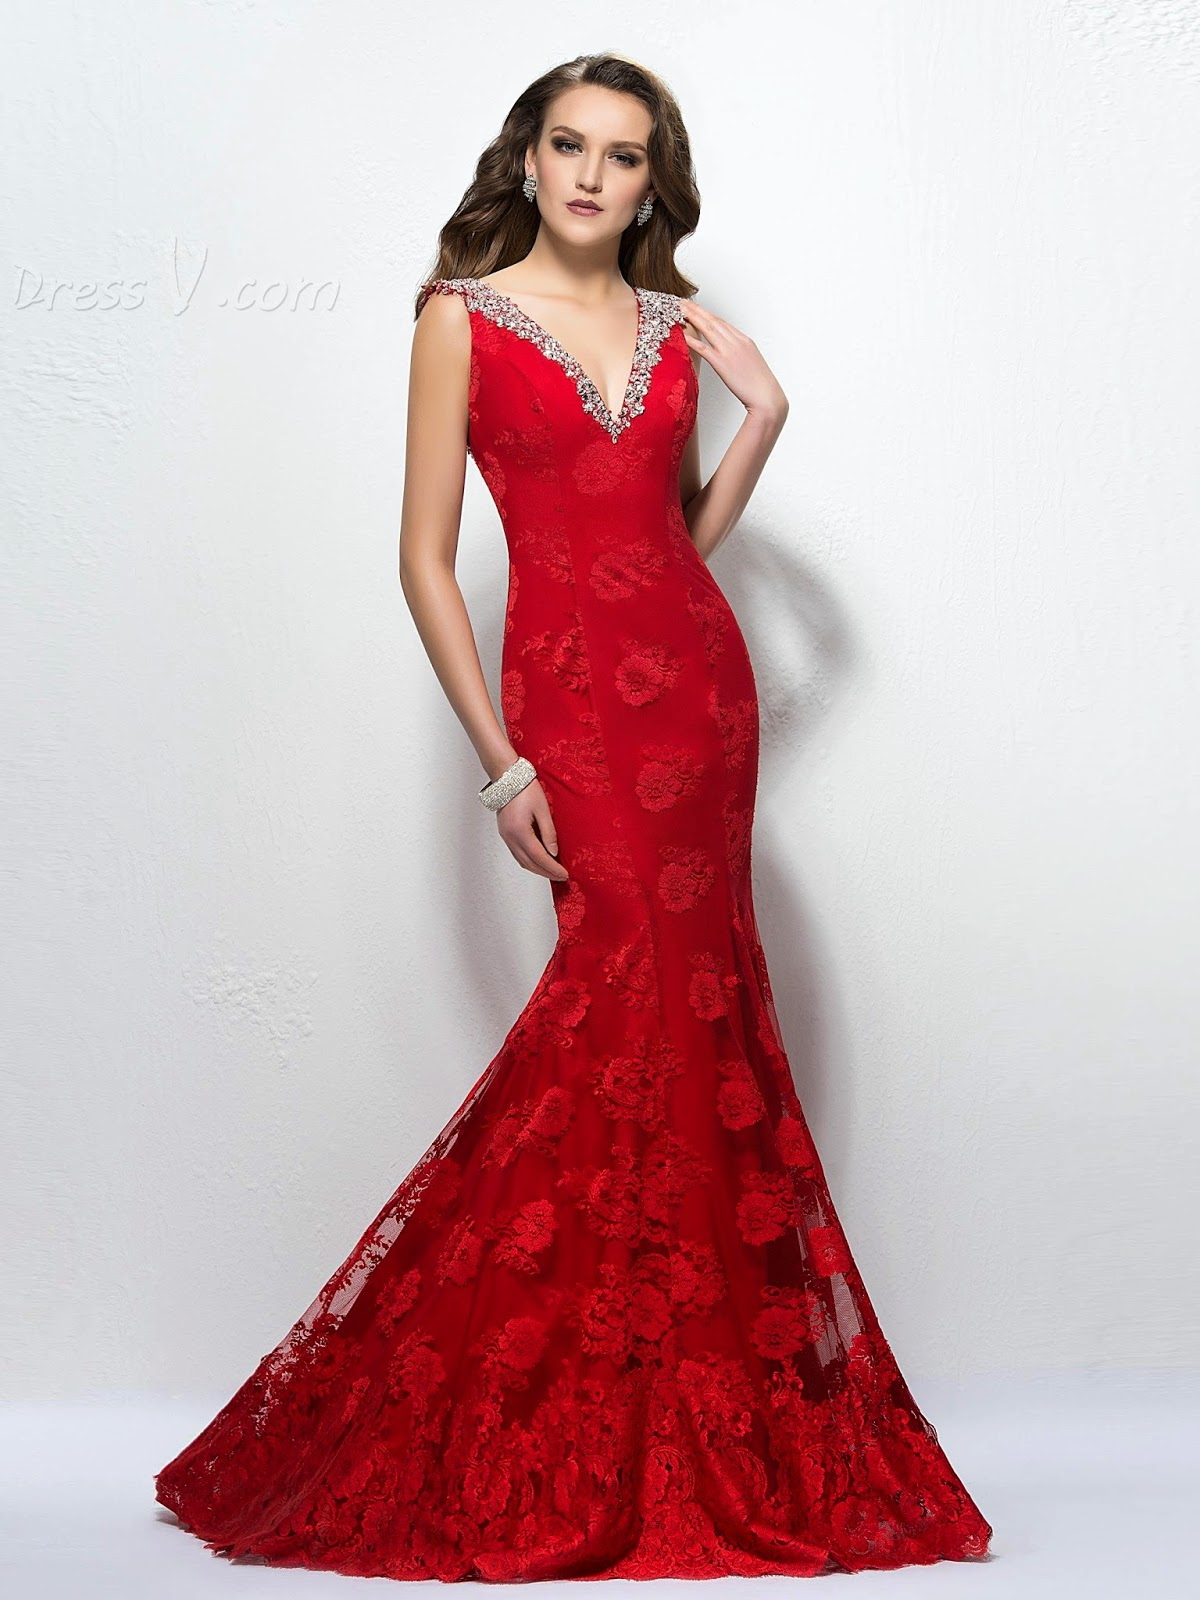 http://www.dressv.com/product/10880910.html